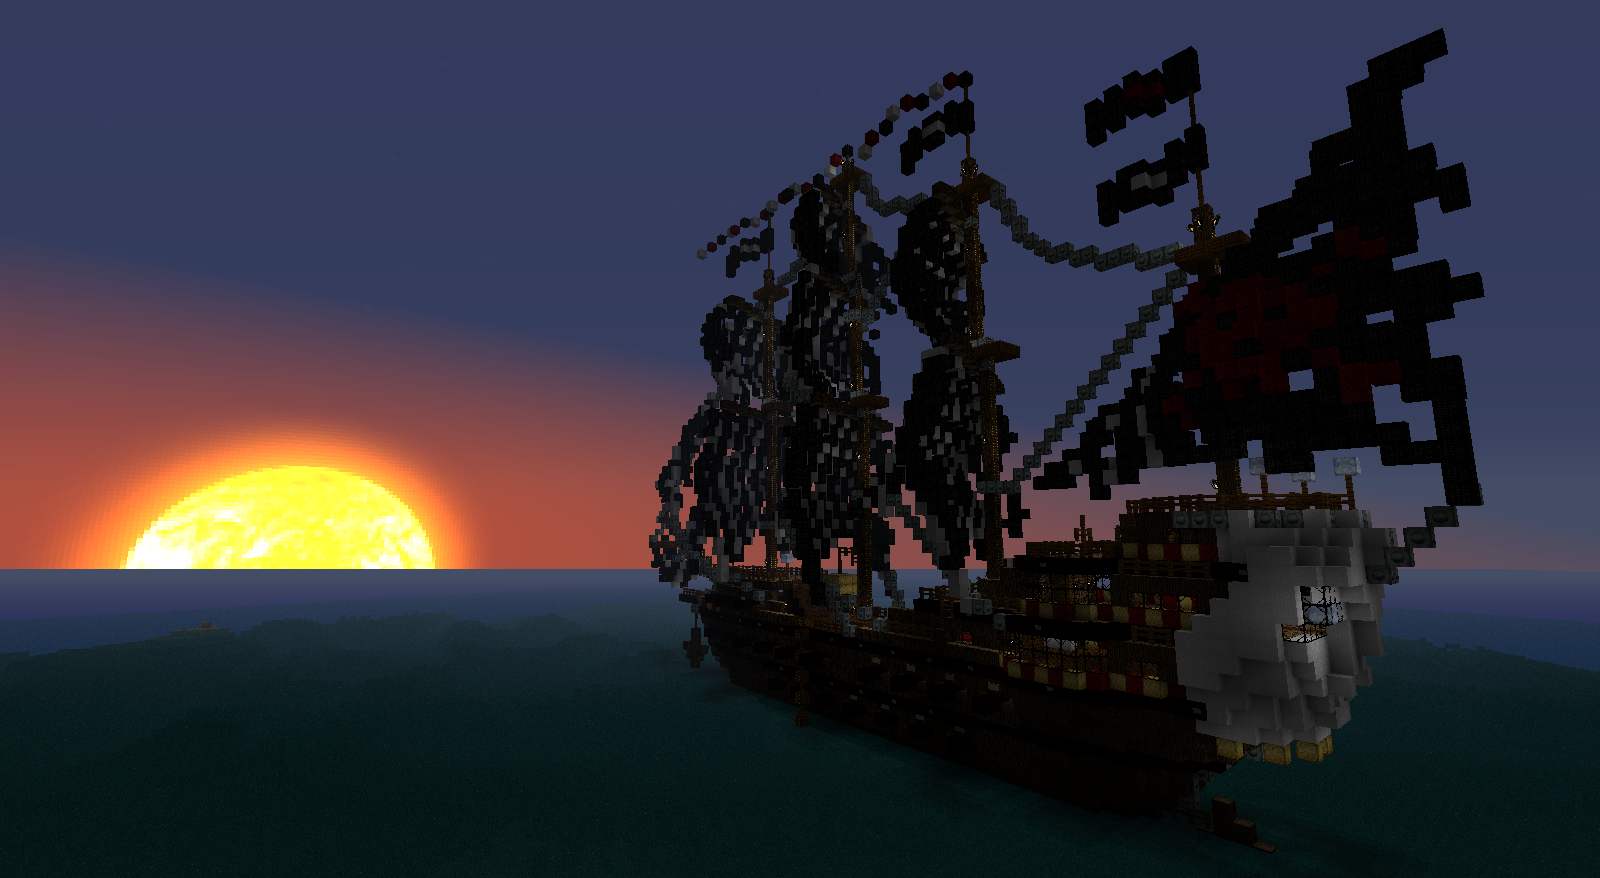 http://2.bp.blogspot.com/-Ne2Le0fftfM/TfXHW8SbOpI/AAAAAAAADiY/kfz4Kn_VeAo/s1600/bateau-pirate-minecraft-02.png